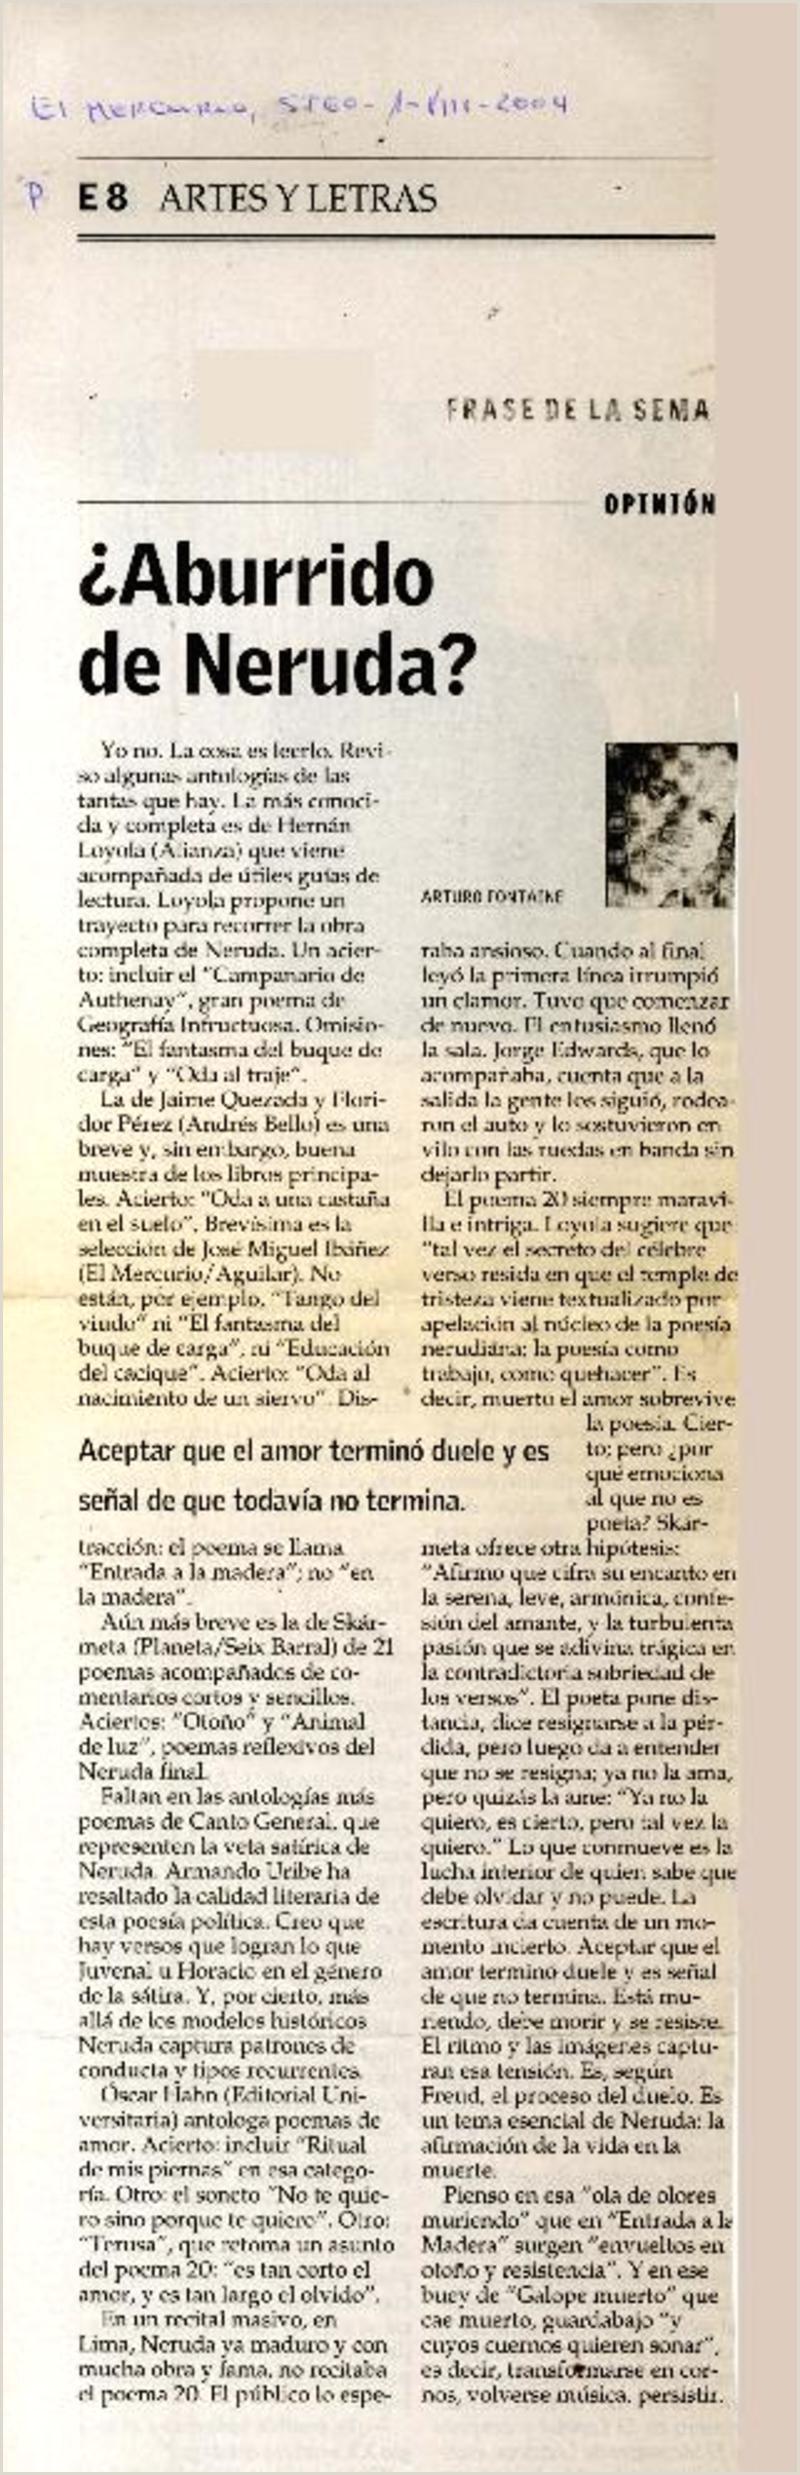 2004 Biblioteca Nacional Digital de Chile